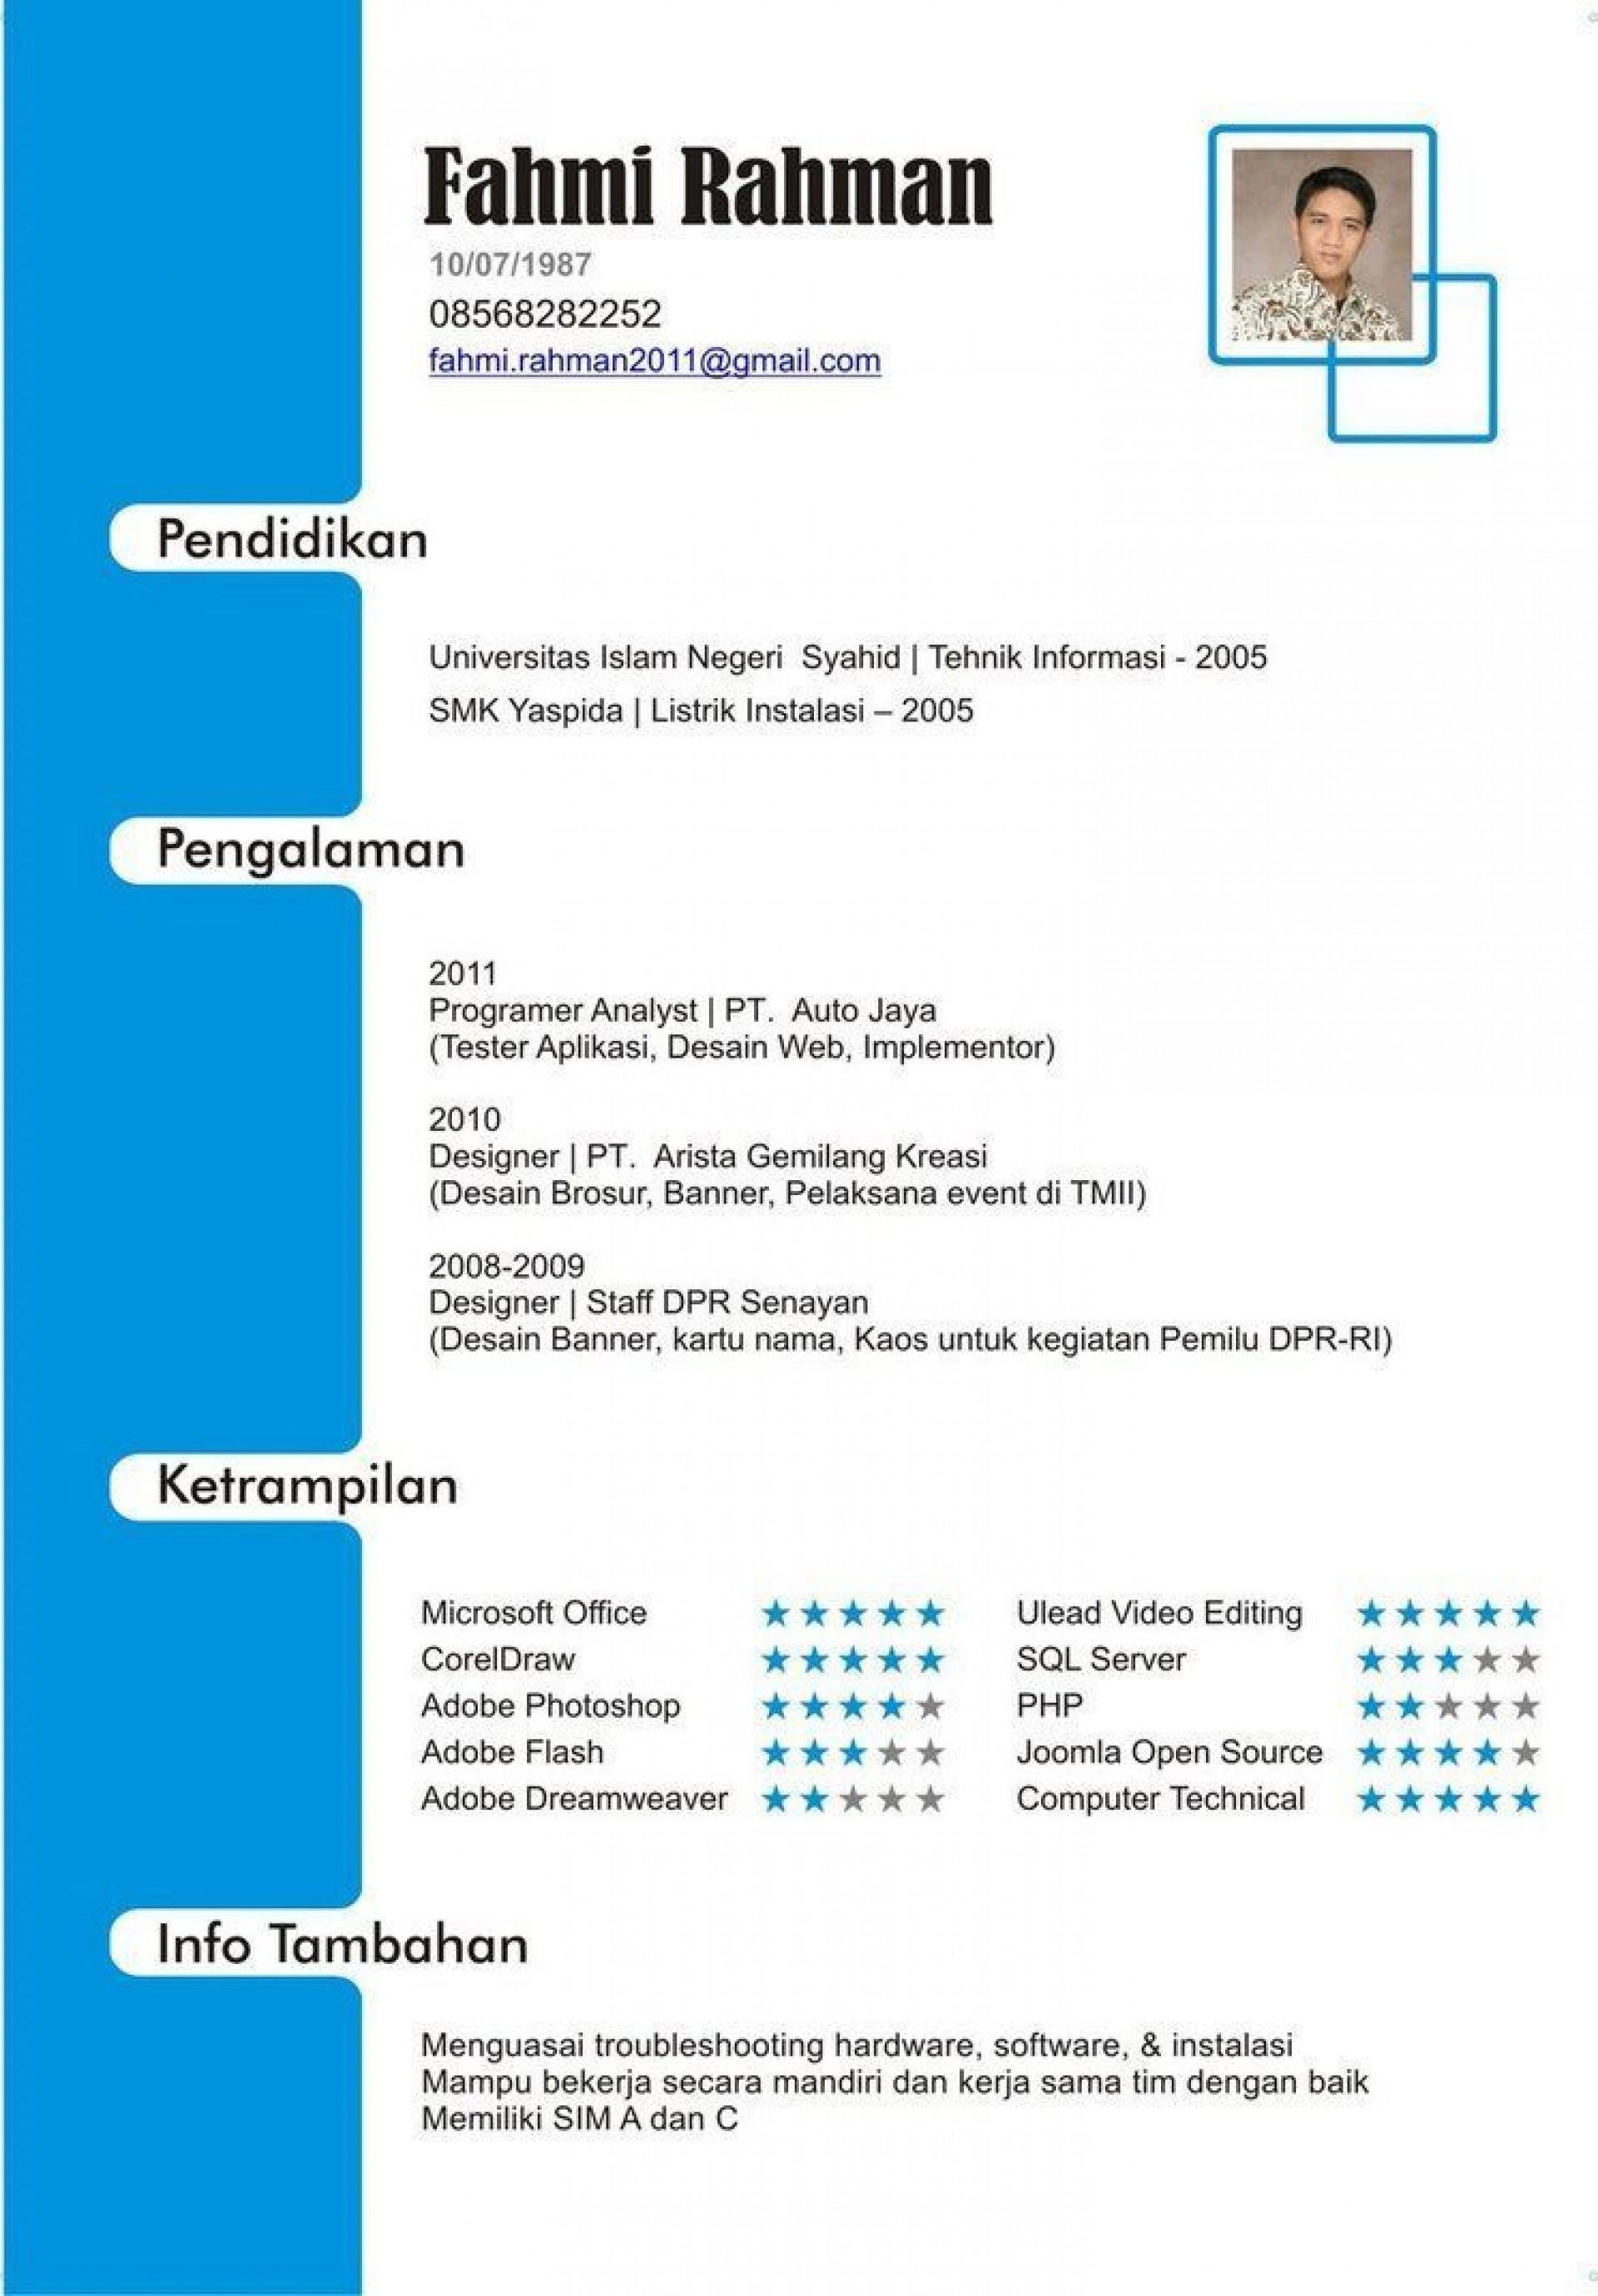 002 Impressive Resume Template On Word Highest Quality  Free Download Australia Microsoft Office 2007 Philippine1920